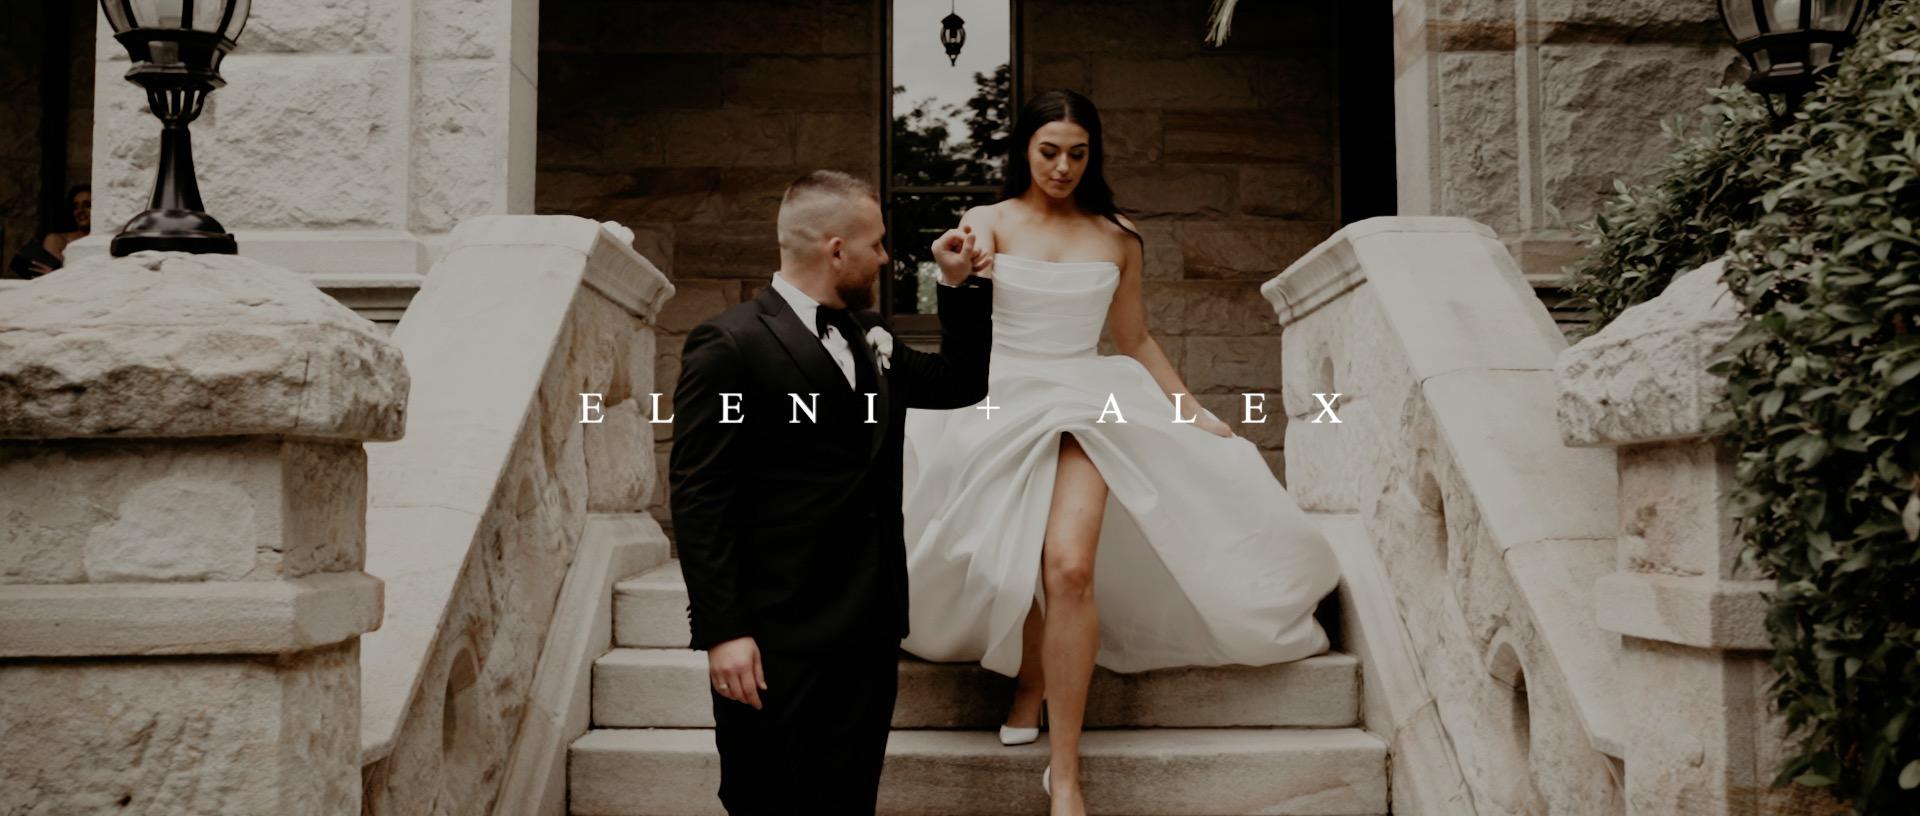 Eleni + Alex | Marsfield, Australia | Curzon Hall